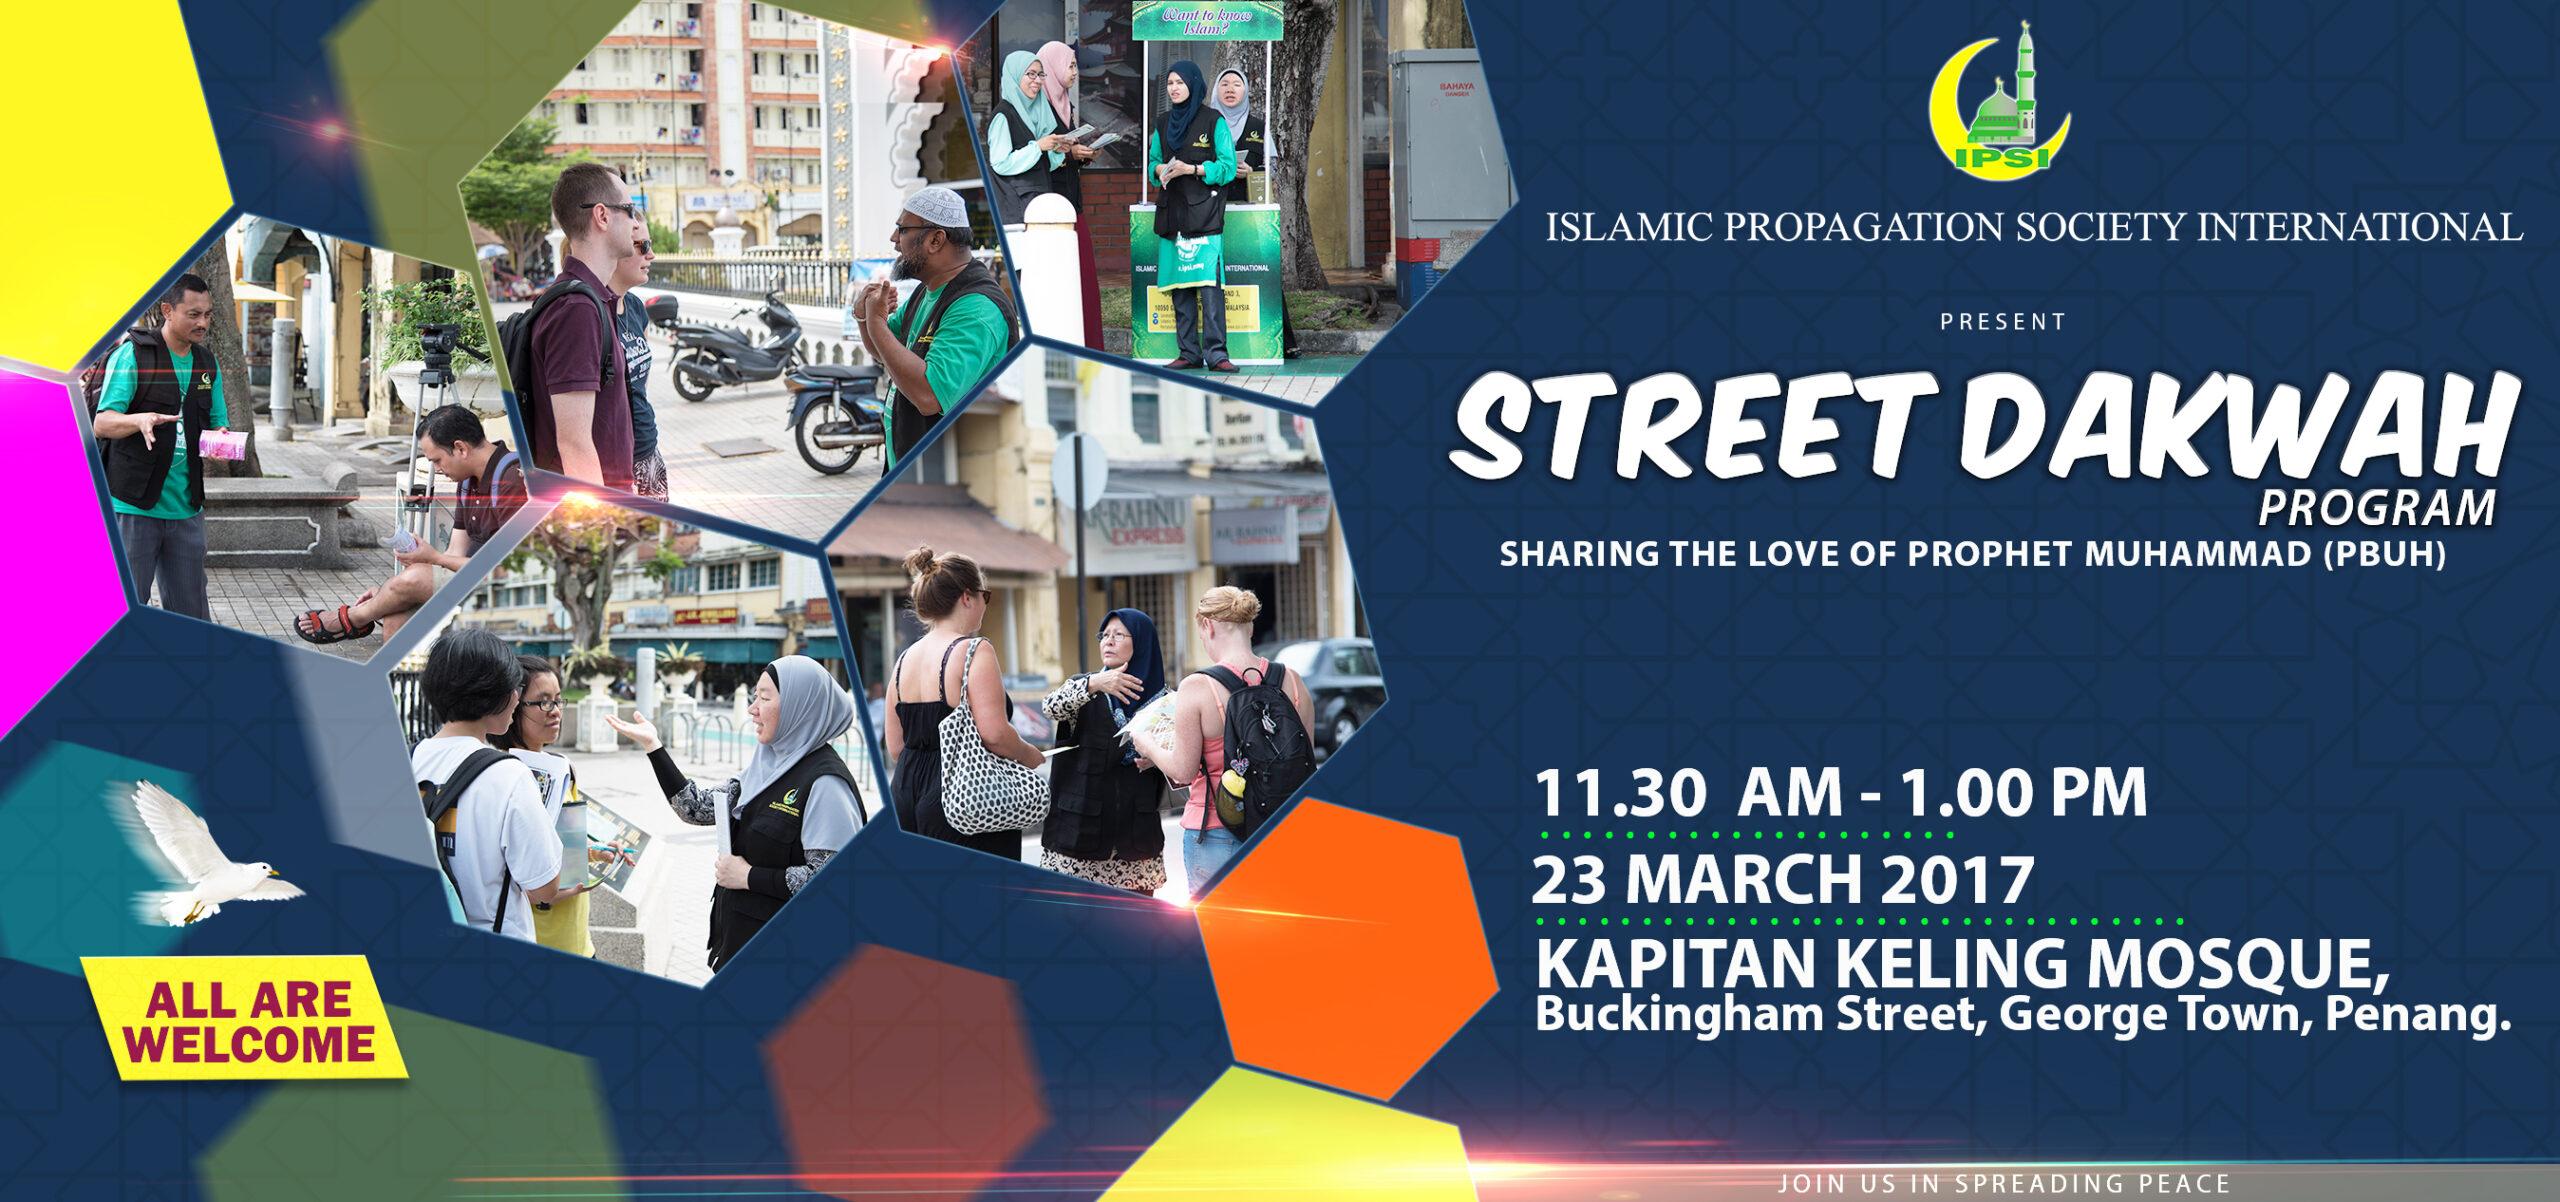 Street Dakwah Program